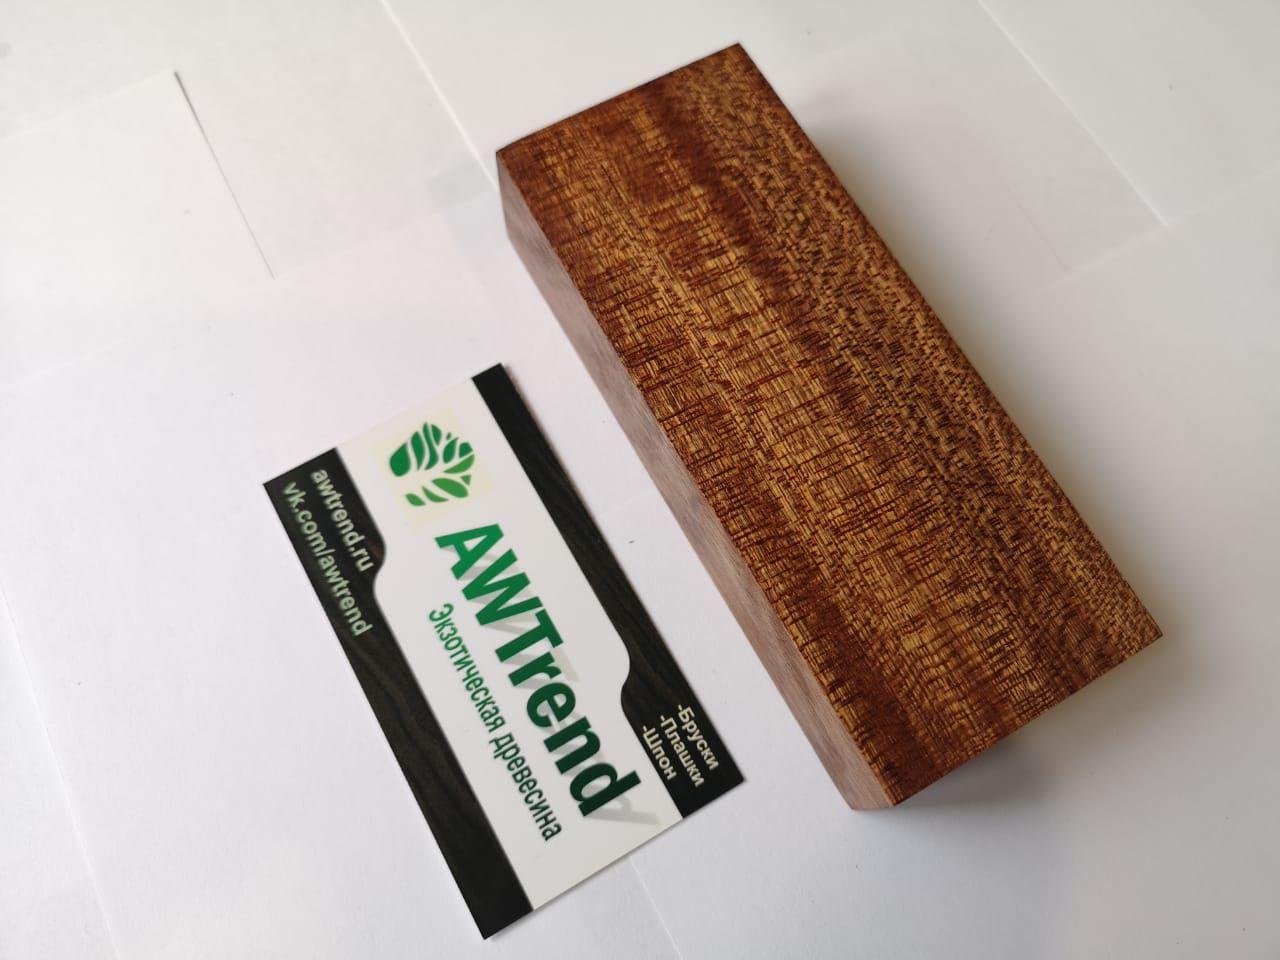 Сапеле (Sapele) плашки 5-7-10-14 мм (толщина выбирается при клике на товар)